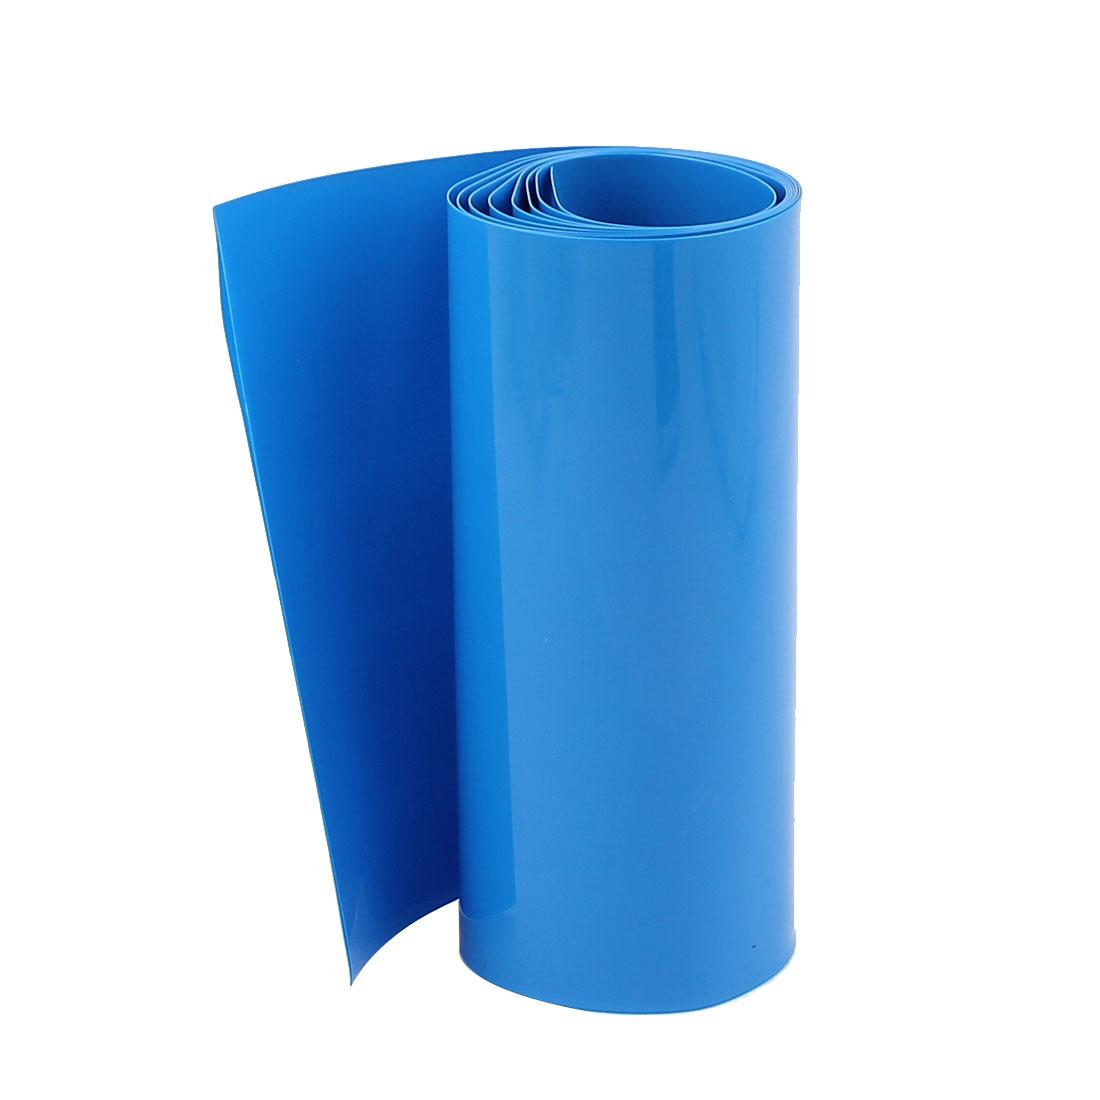 PVC Heat Shrink Tubing 103mm Flat Width Heat Shrink Wrap Tube for 18650 3.3ft